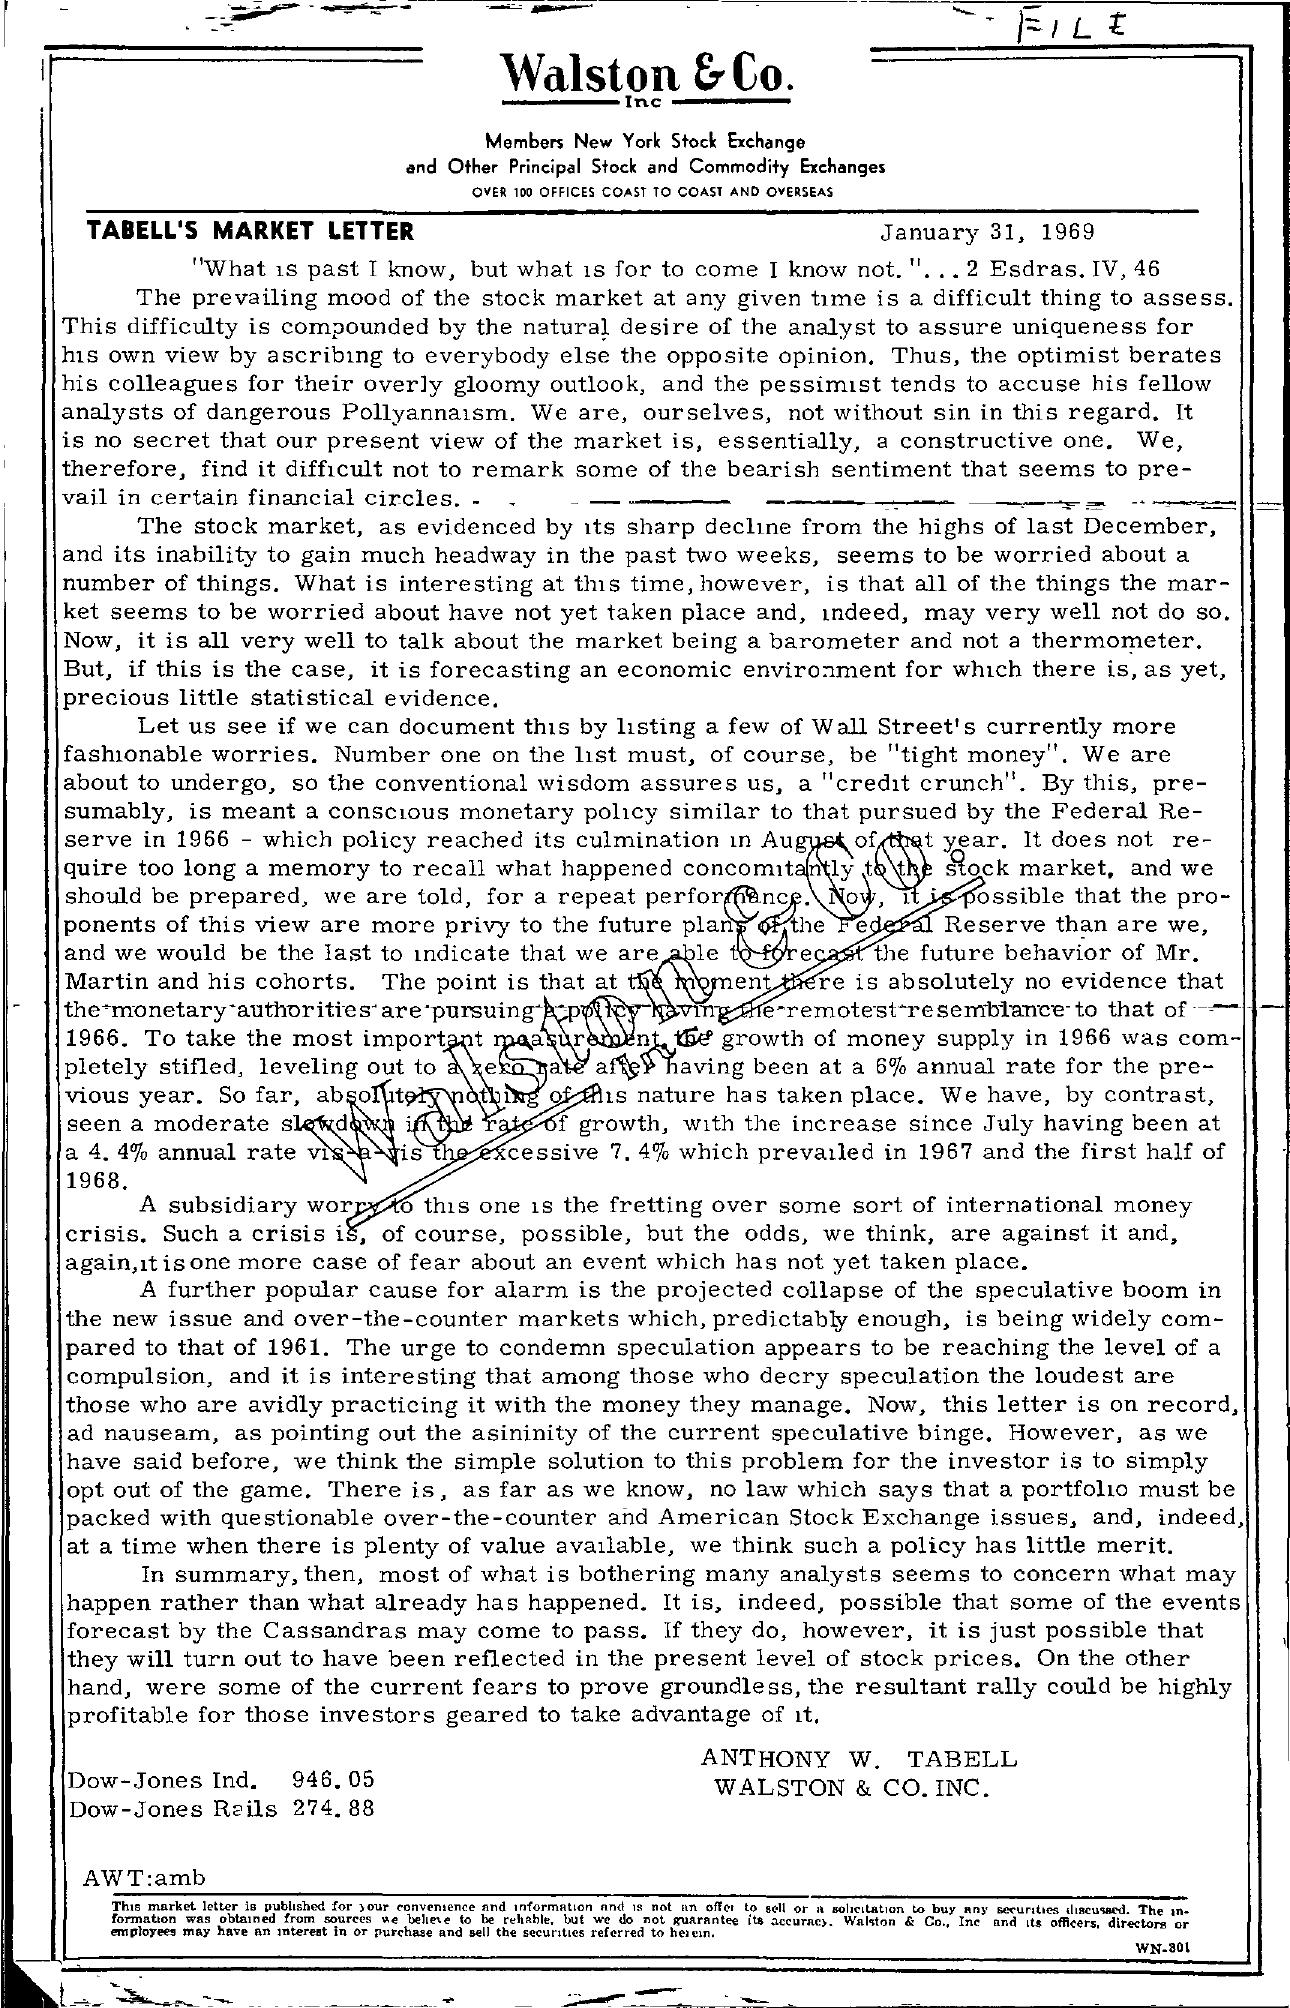 Tabell's Market Letter - January 31, 1969